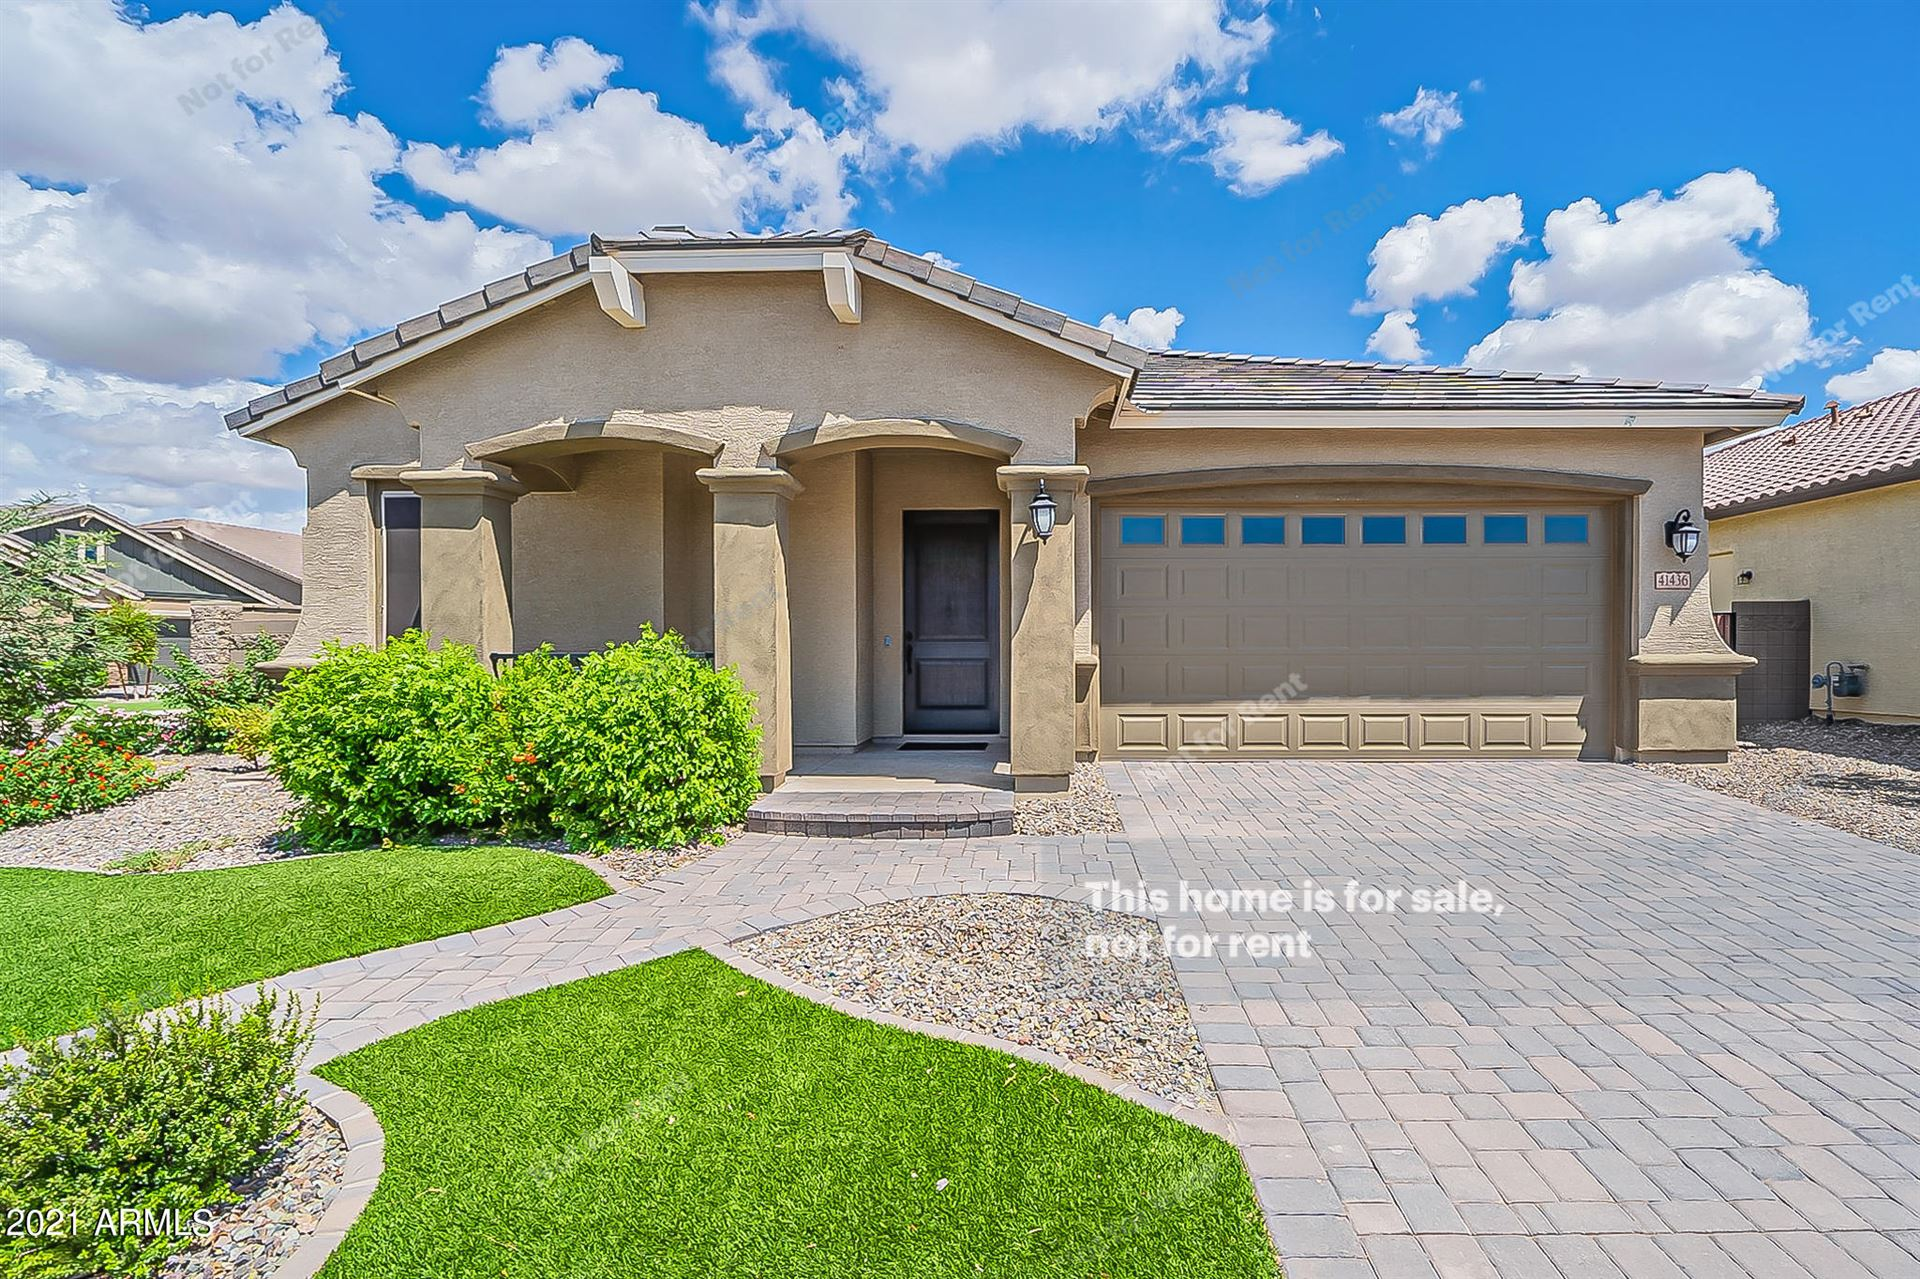 Photo for 41436 W CENTENNIAL Drive, Maricopa, AZ 85138 (MLS # 6280198)